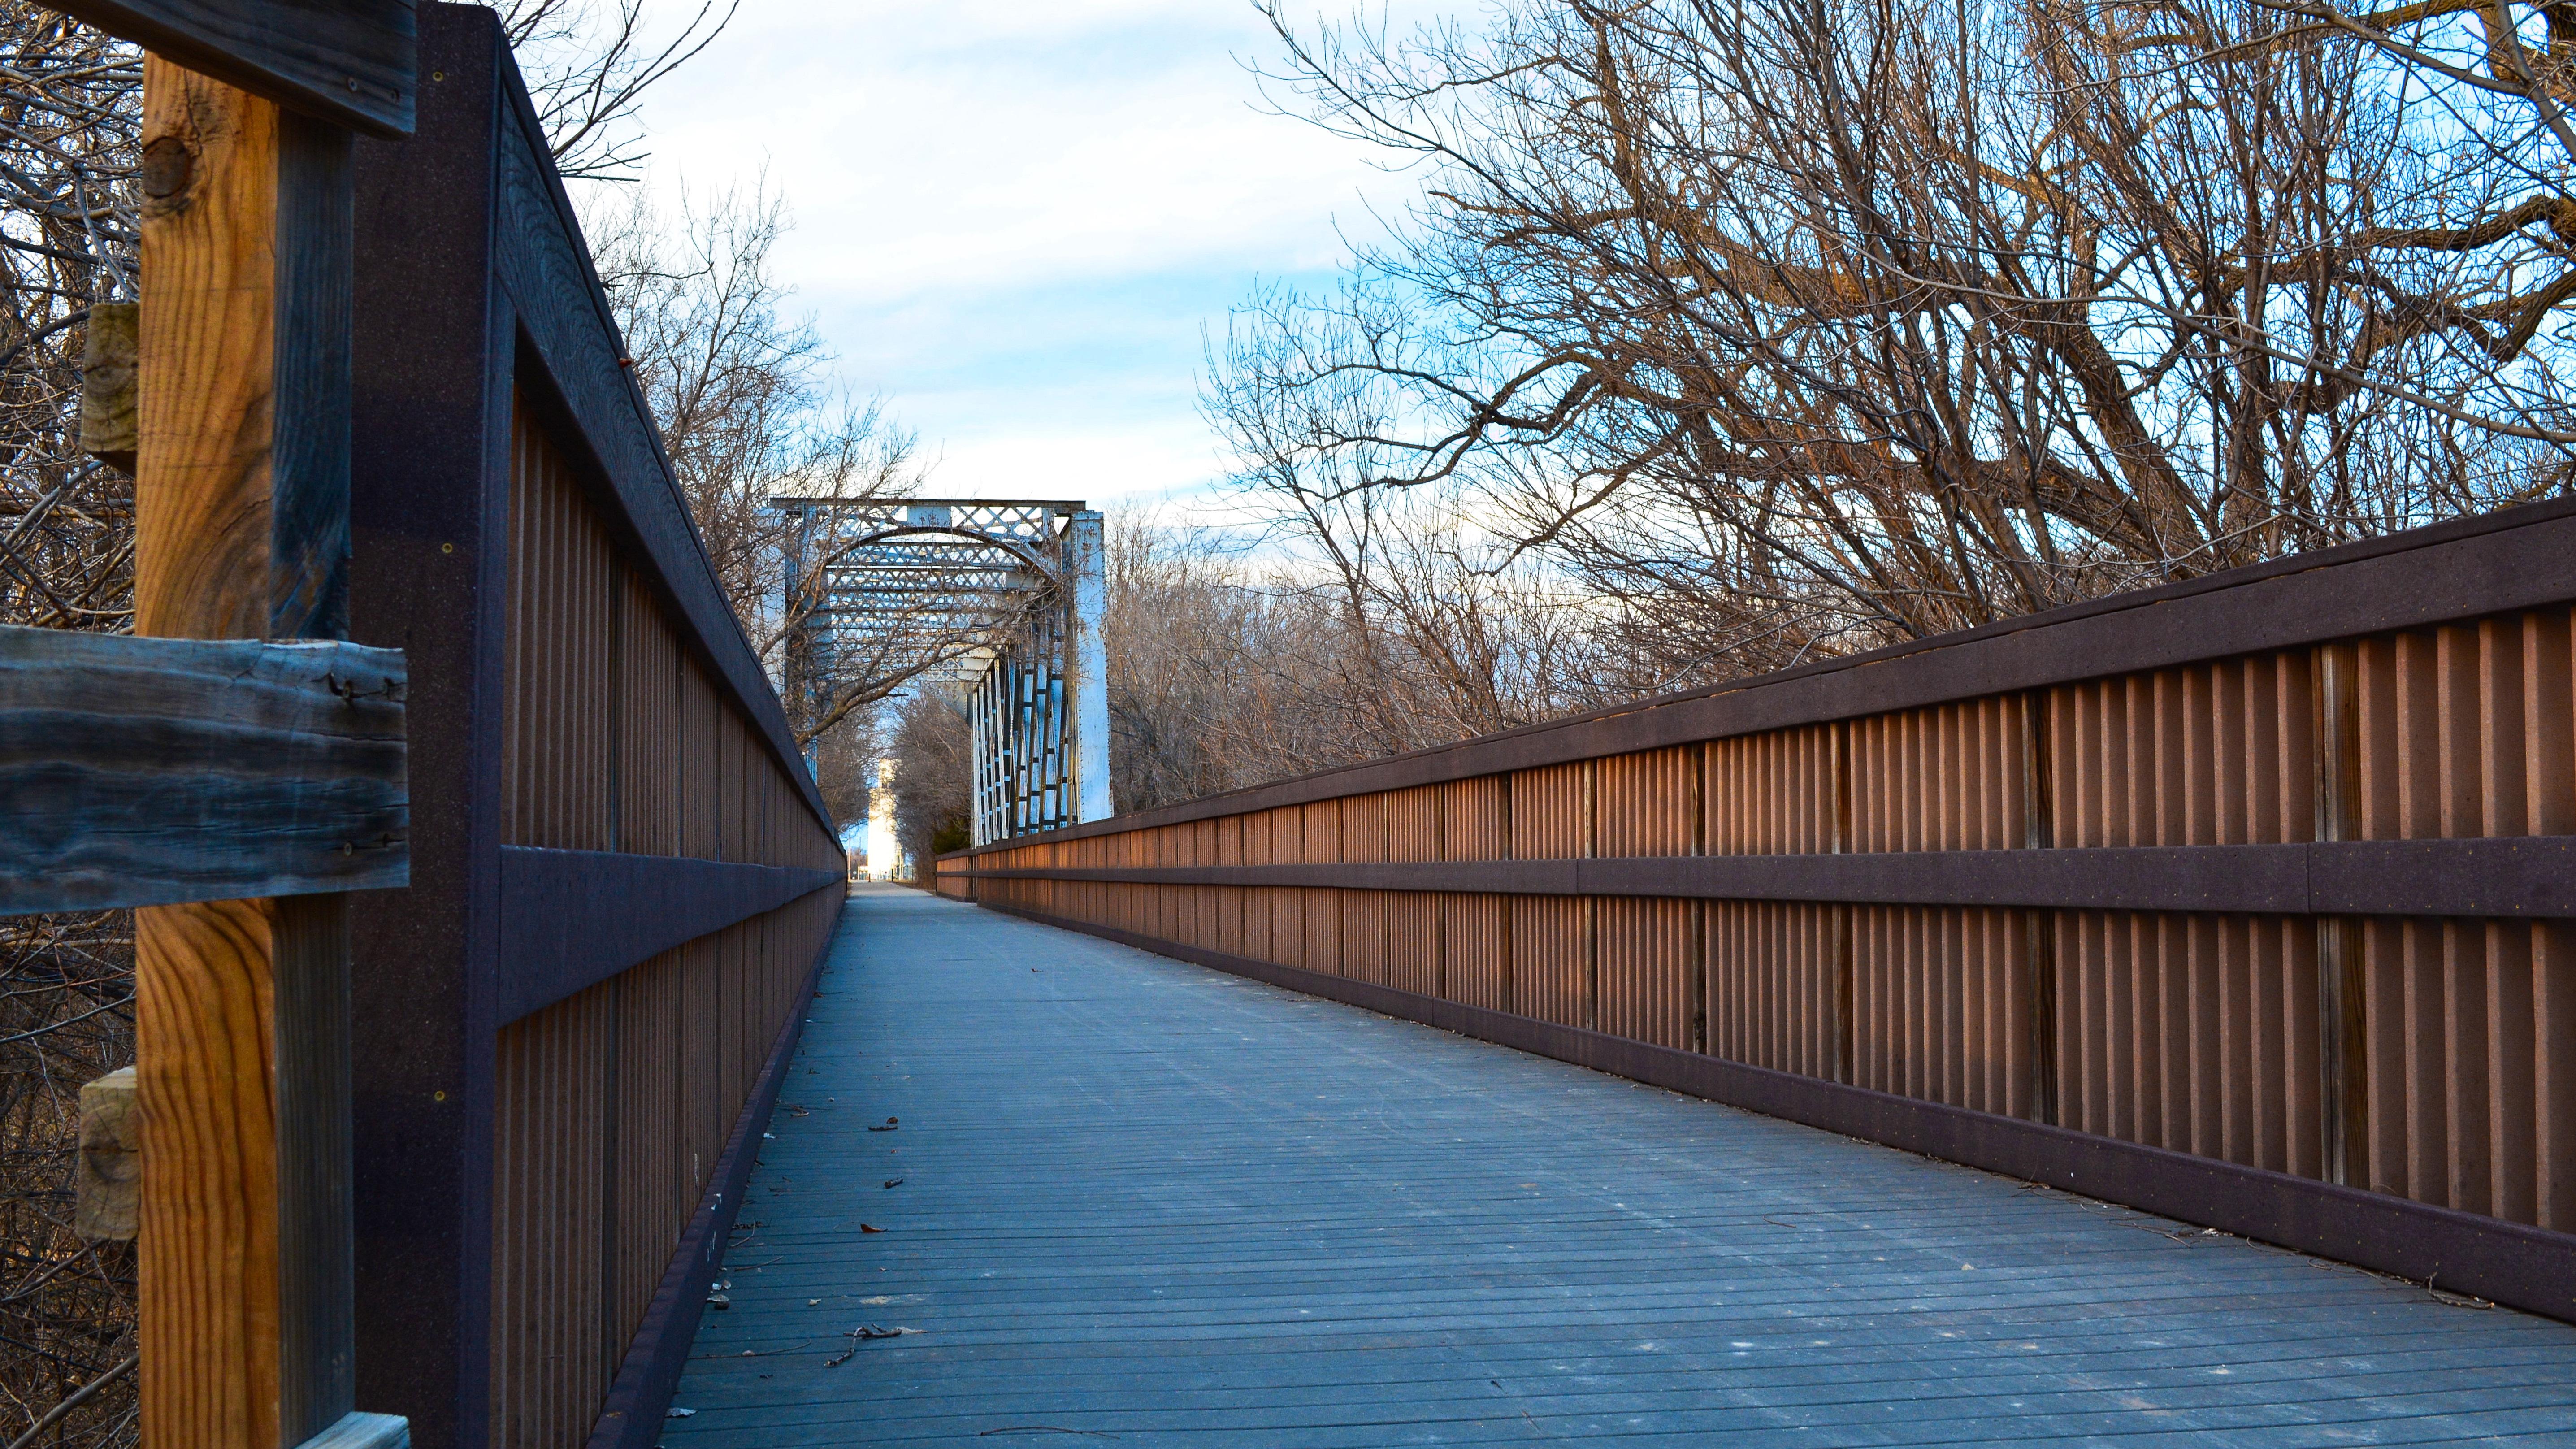 Walk the bridge blue skies